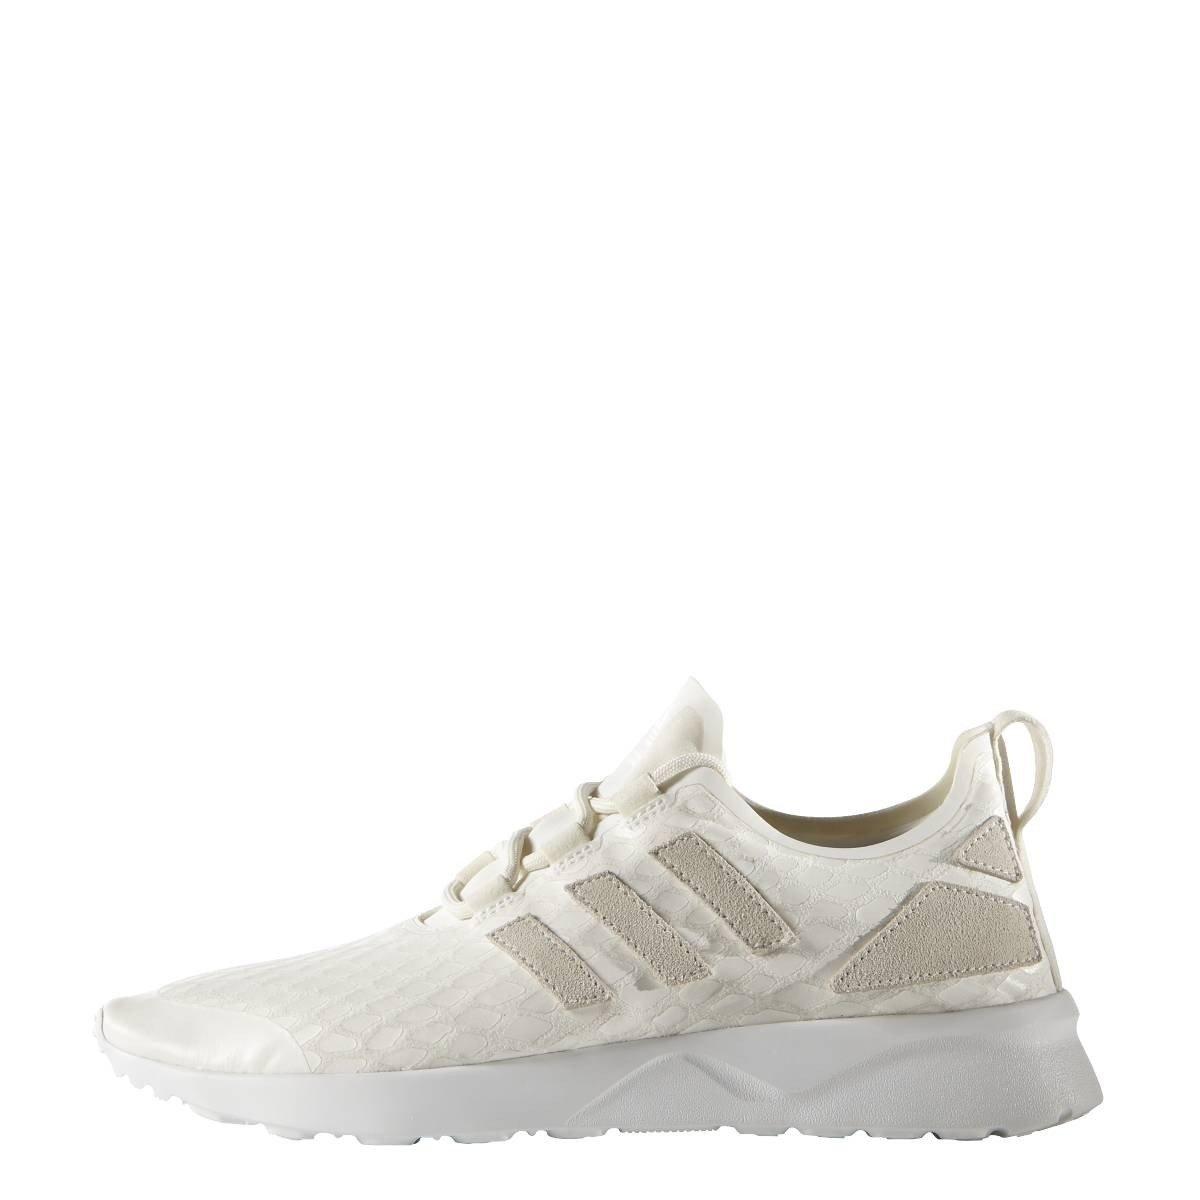 Adidas Originals ZX Flux ADV Verve W Schuhe Damen Weiß Turnschuhe Laufschuhe Weiß Damen AQ6251 122f70